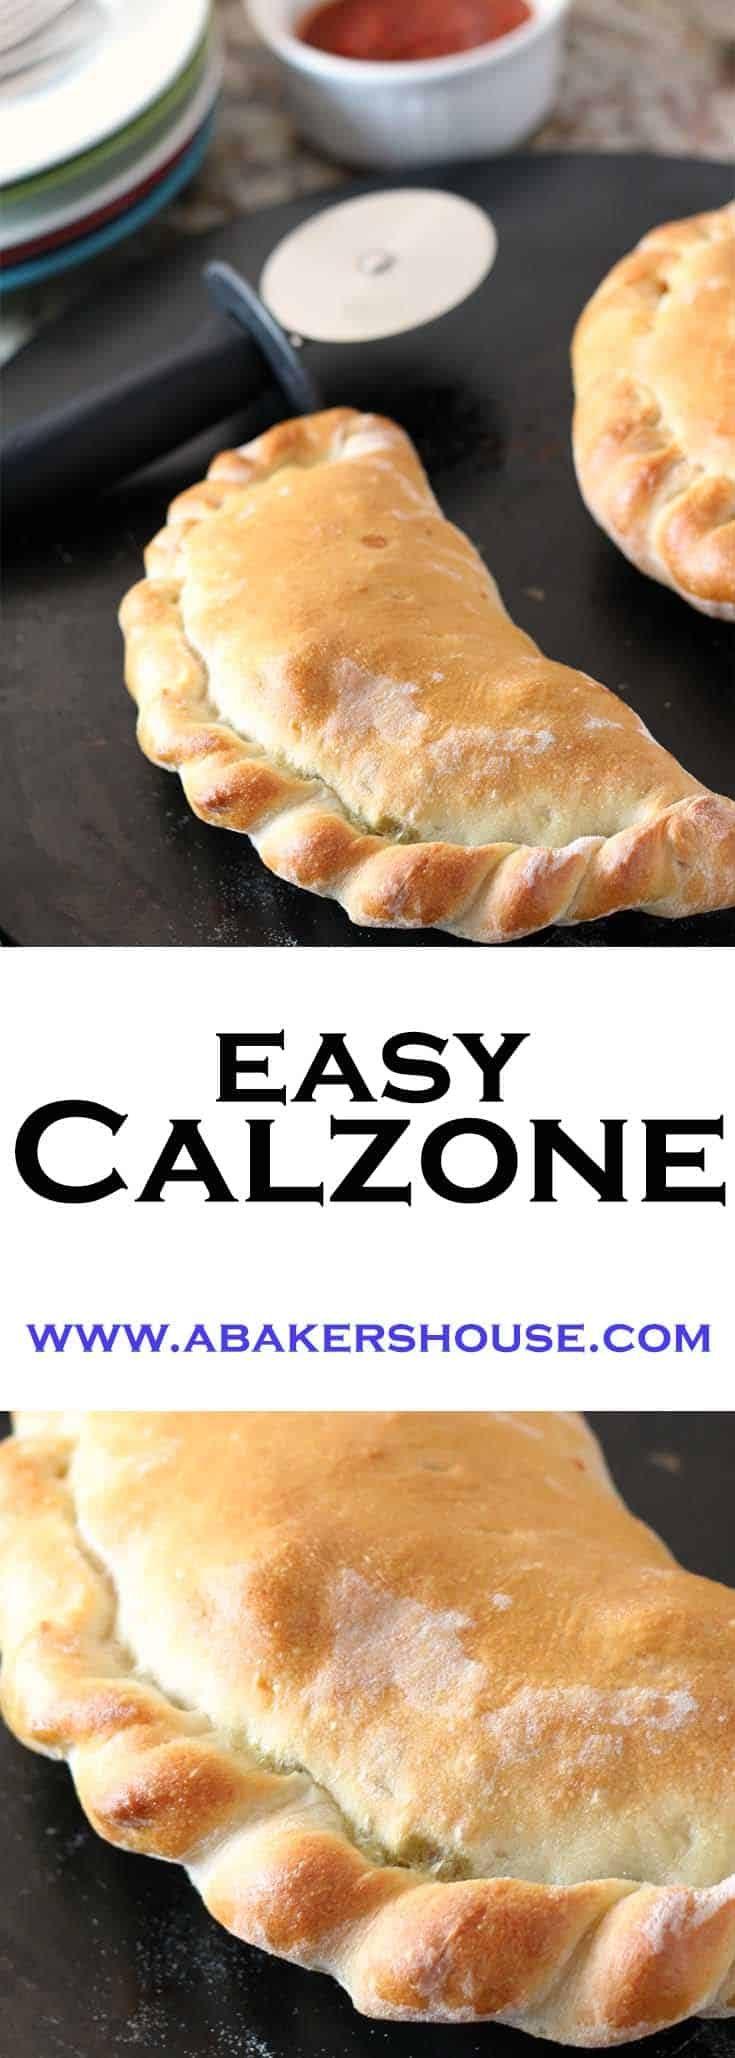 Easy to make homemade calzone. Dough folded around sauce and fillings makes a wonderful baked calzone. King Arthur Flour recipe #kingarthur #calzone #breadrecipe #abakershouse